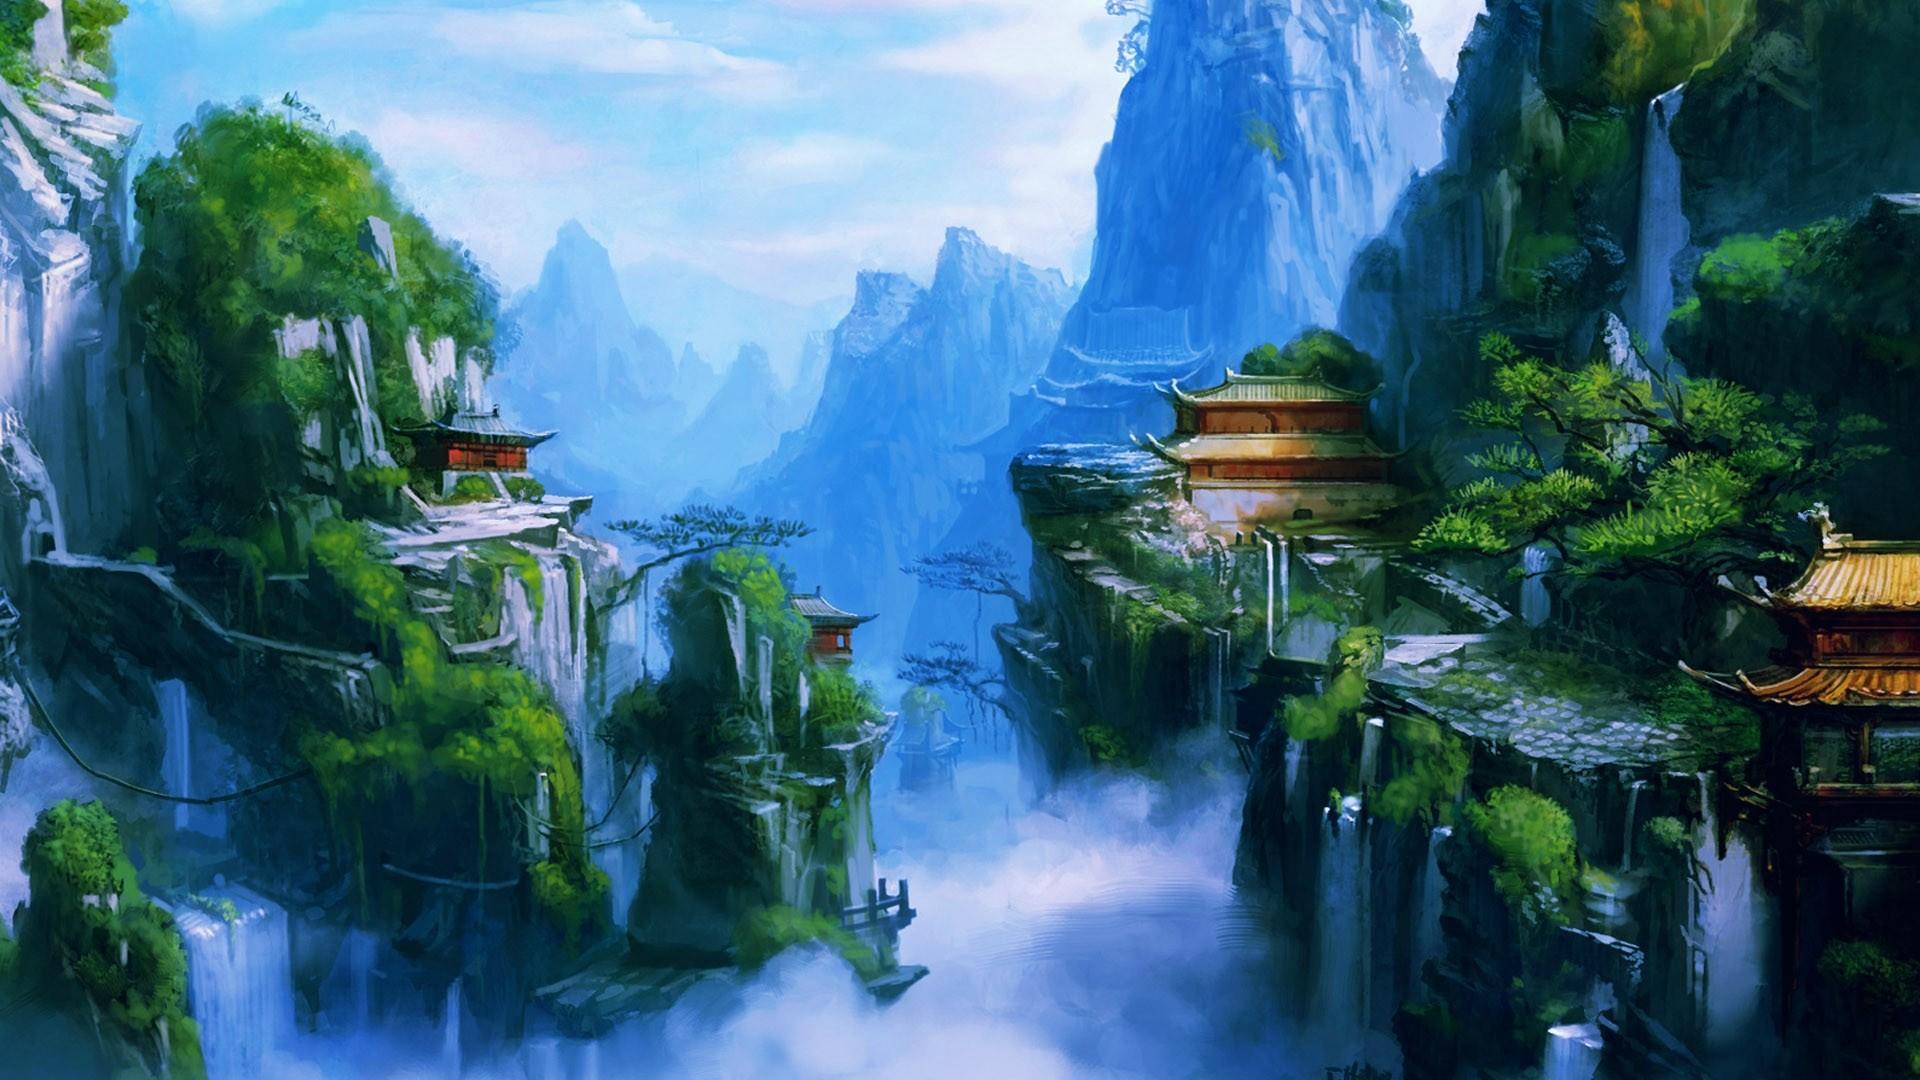 https://www.wallpaperup.com/uploads/wallpapers/2013/01/23/30998/60656f63cb2dabf87bf8c4af2877fd9c.jpg  | Beautiful Asian Art | Pinterest | Fantasy landscape, …